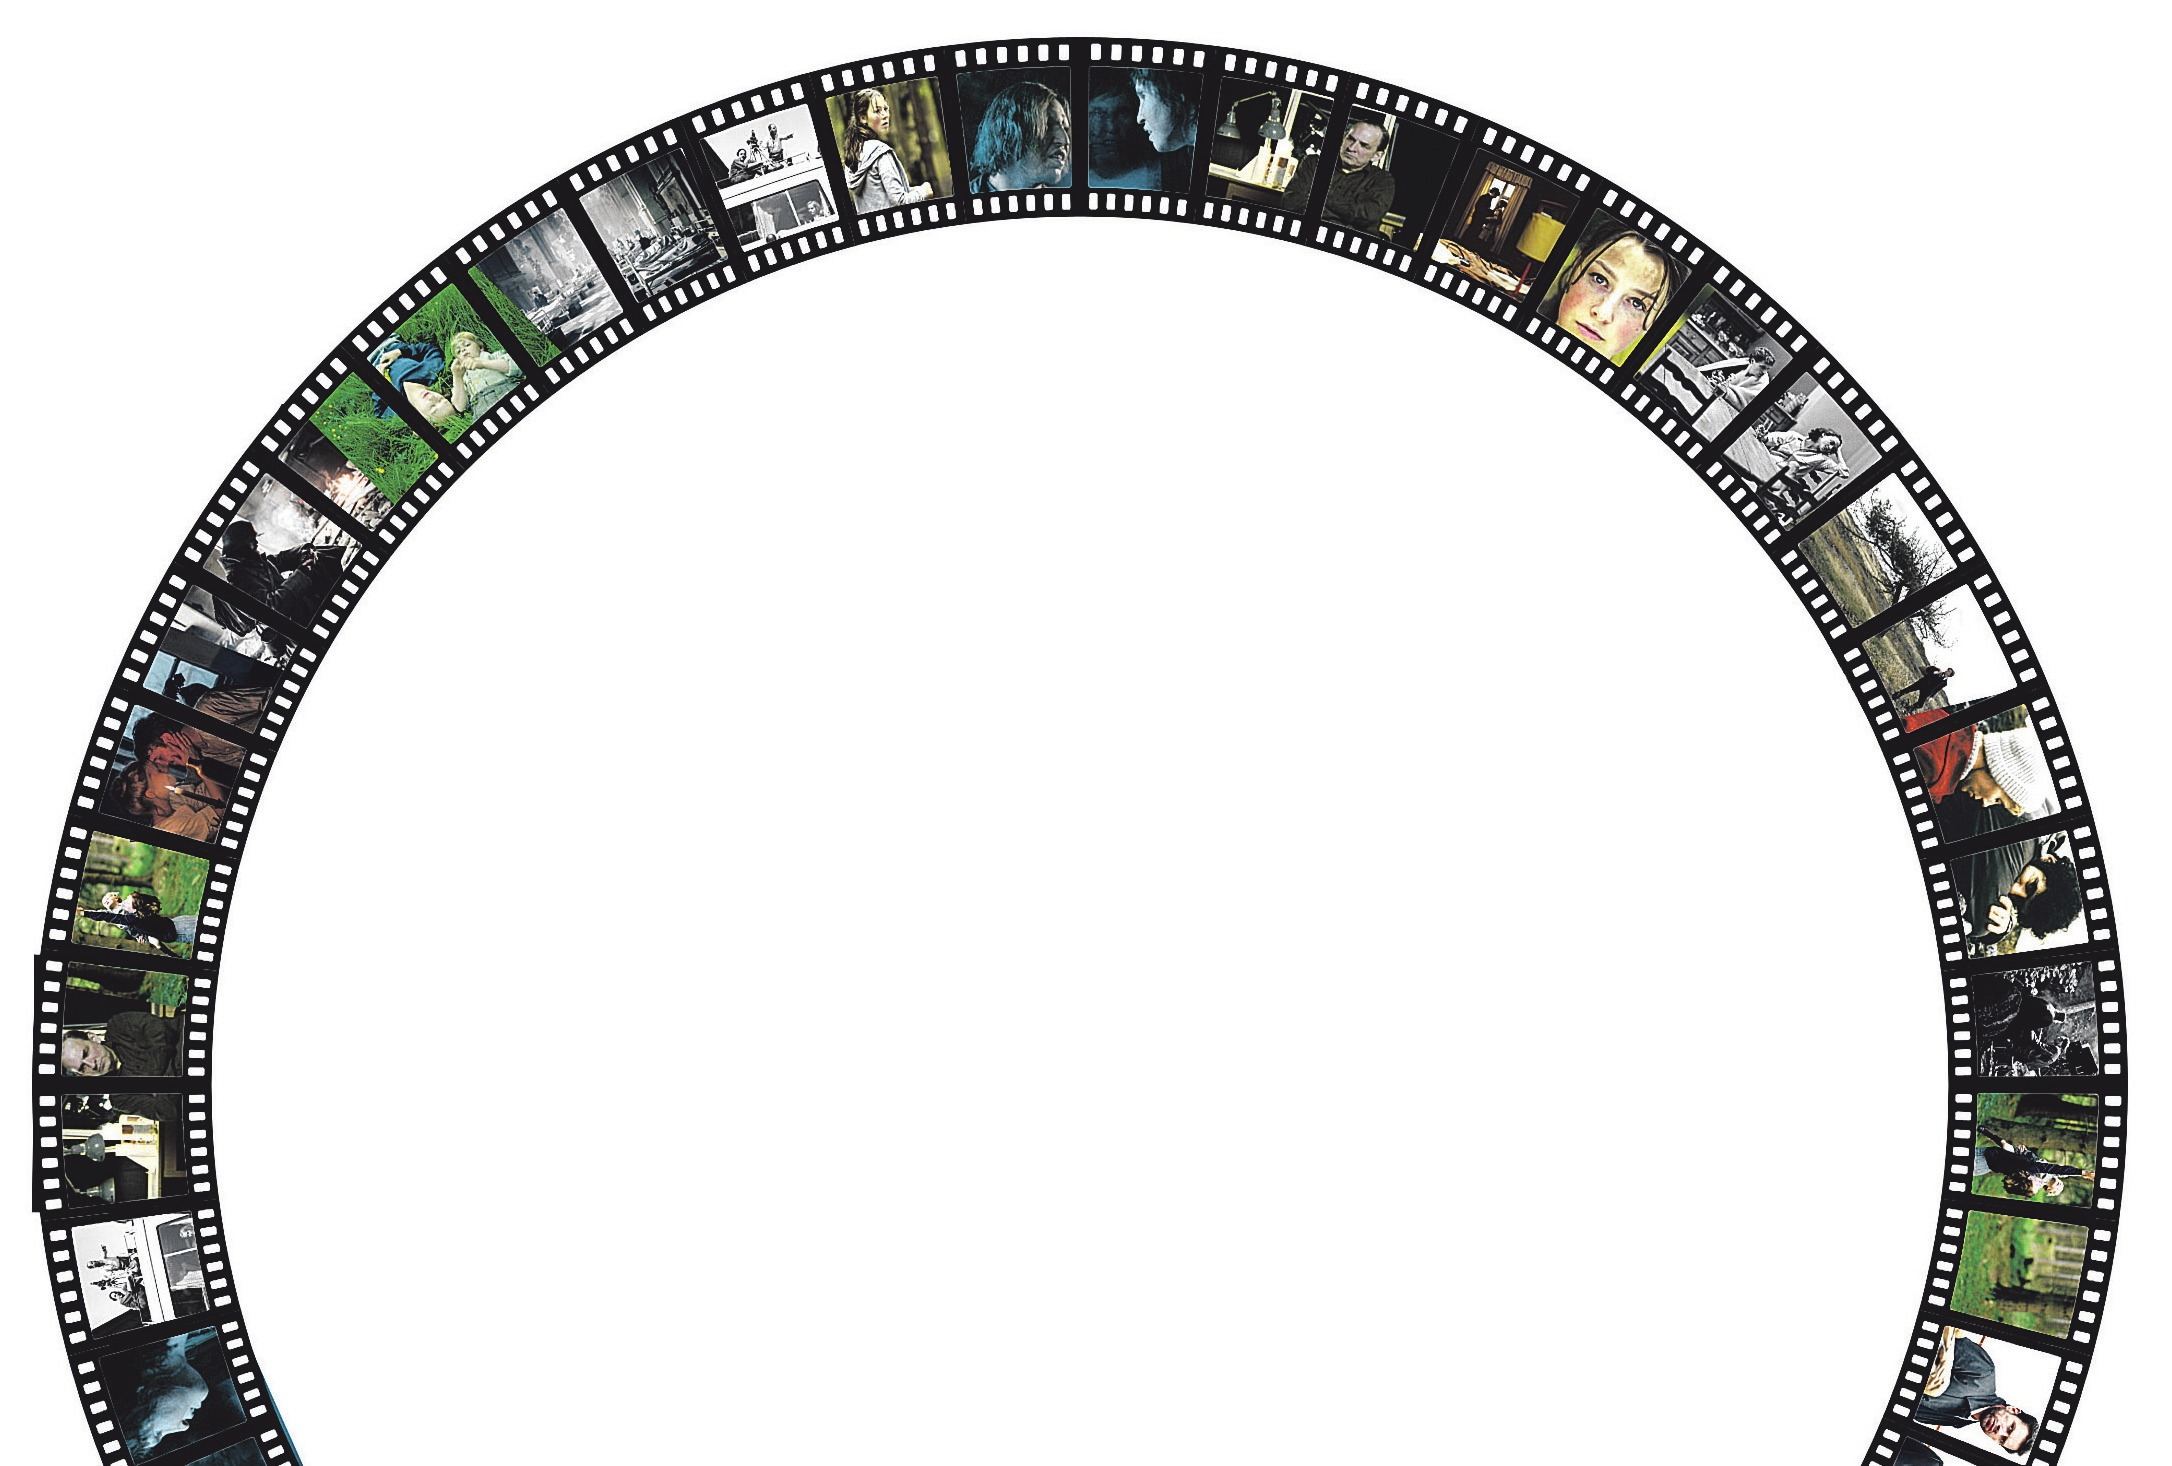 FOTOS: AGNETE BRUN, NORDISK FILM PRODUCTION, ROLF KONOW, ERIK HANSMOLBERGEN/DCM, AB SVENSK FILMINDUSTRI, JESPER WALDERSTEN, META SPARK &KÄRNFILM, SWEDISH FILM INSTITUTE, STANISLAV HONZIK, ZENTROPA, HENRIK OHSTEN, HFR/PIXABAY